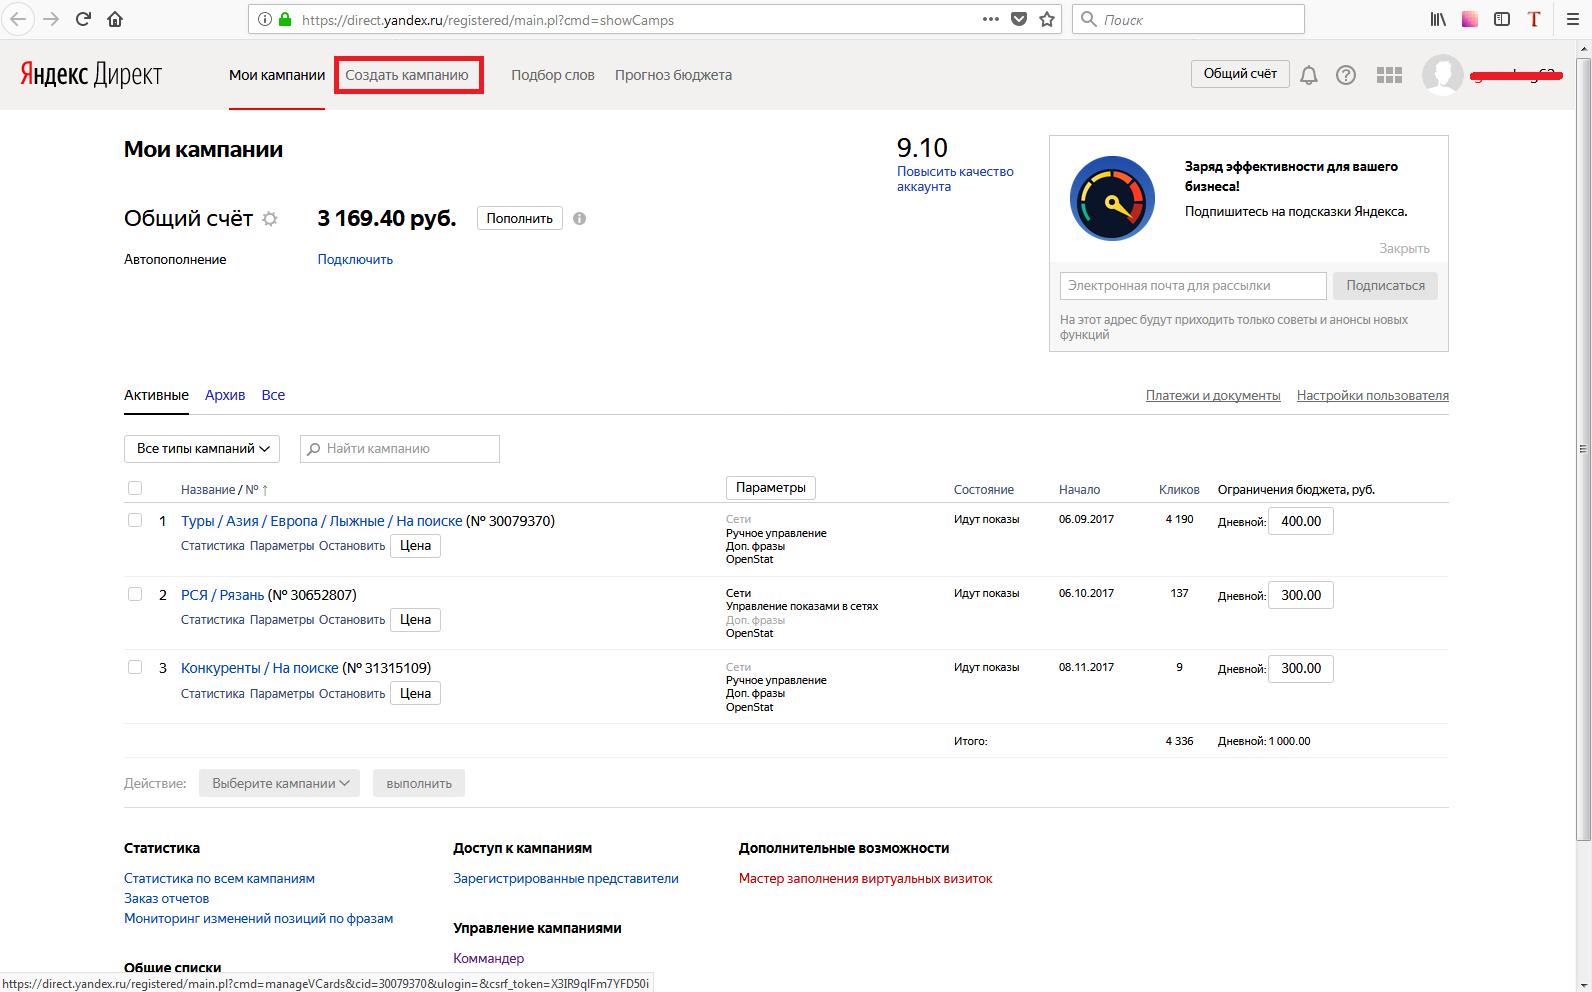 Яндекс директ реклама в андроид